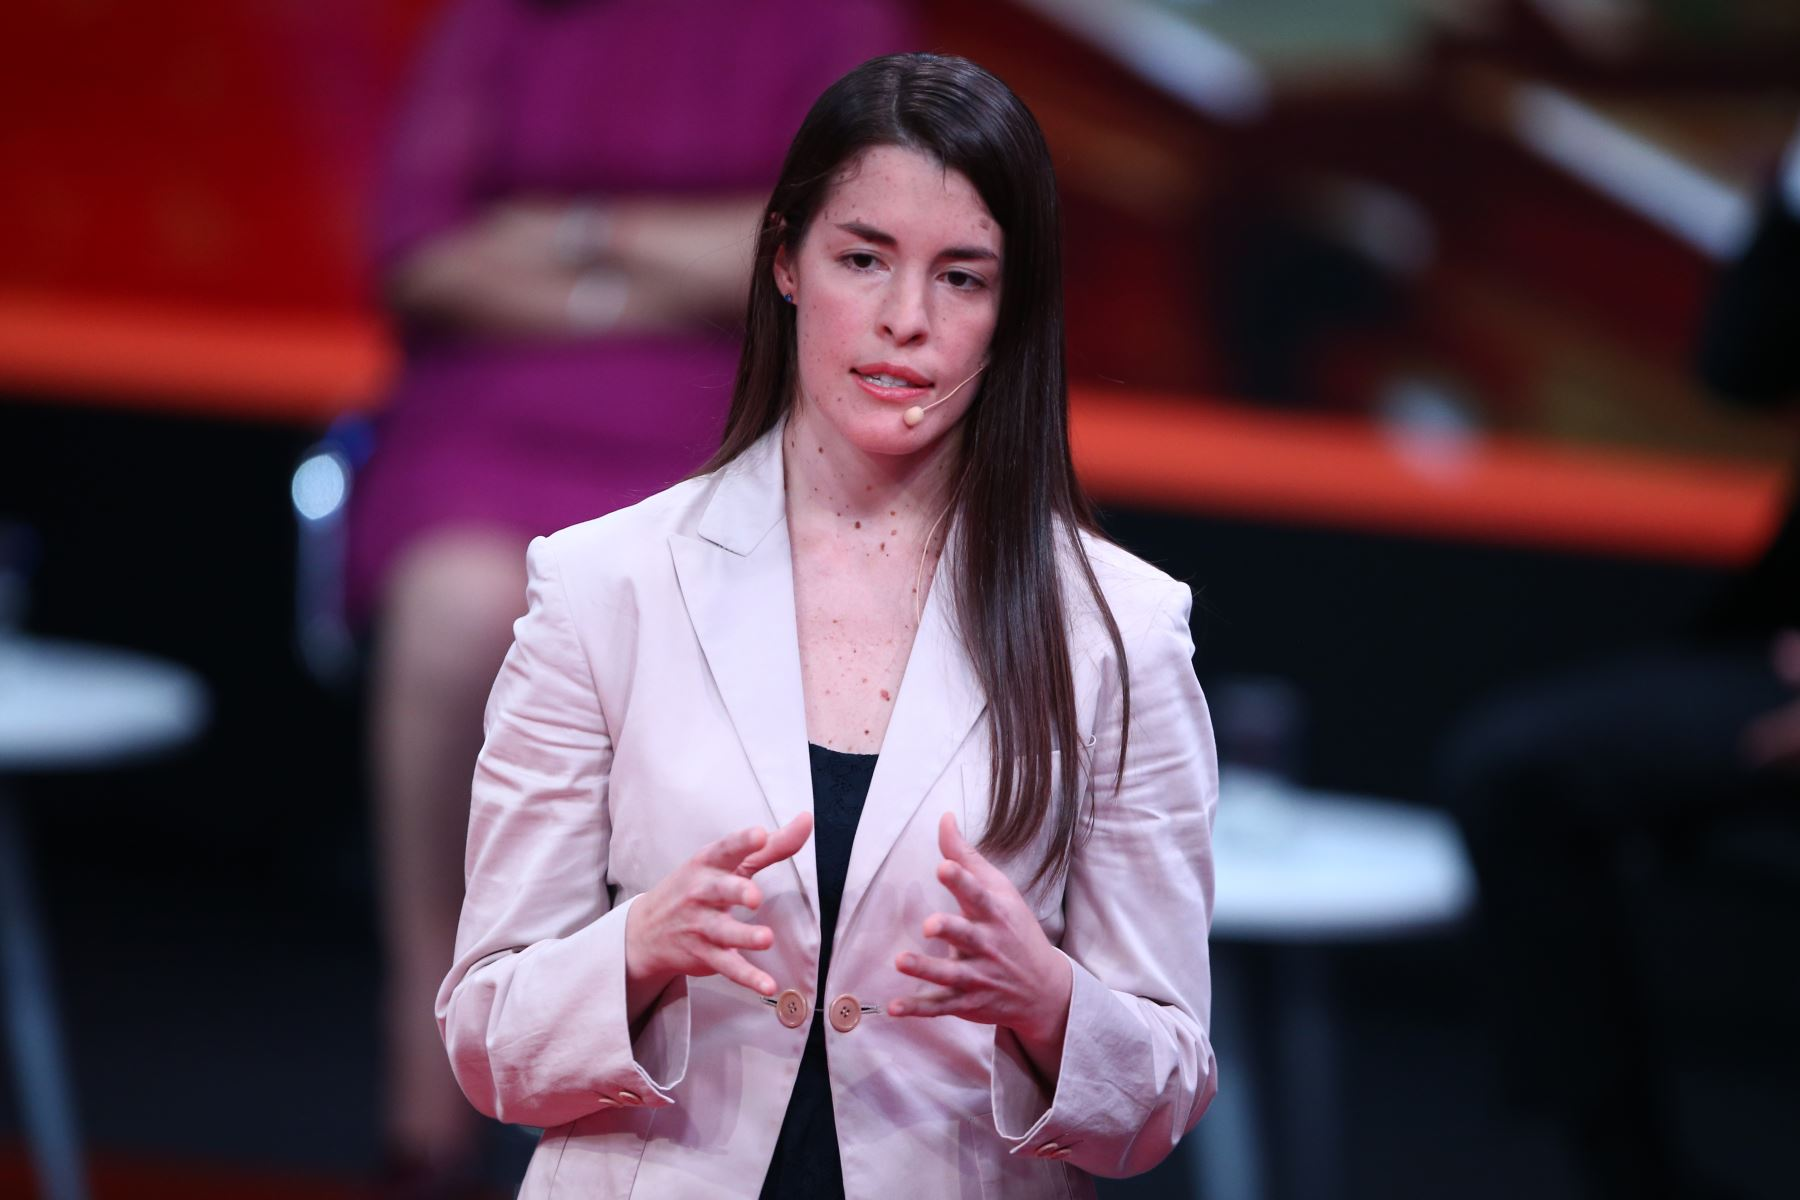 Alessandra Krause, candidata al Congreso por partido político Contigo Directa participa en segundo debate de Lima Metropolitana. Foto: ANDINA/Tarqui Vidal